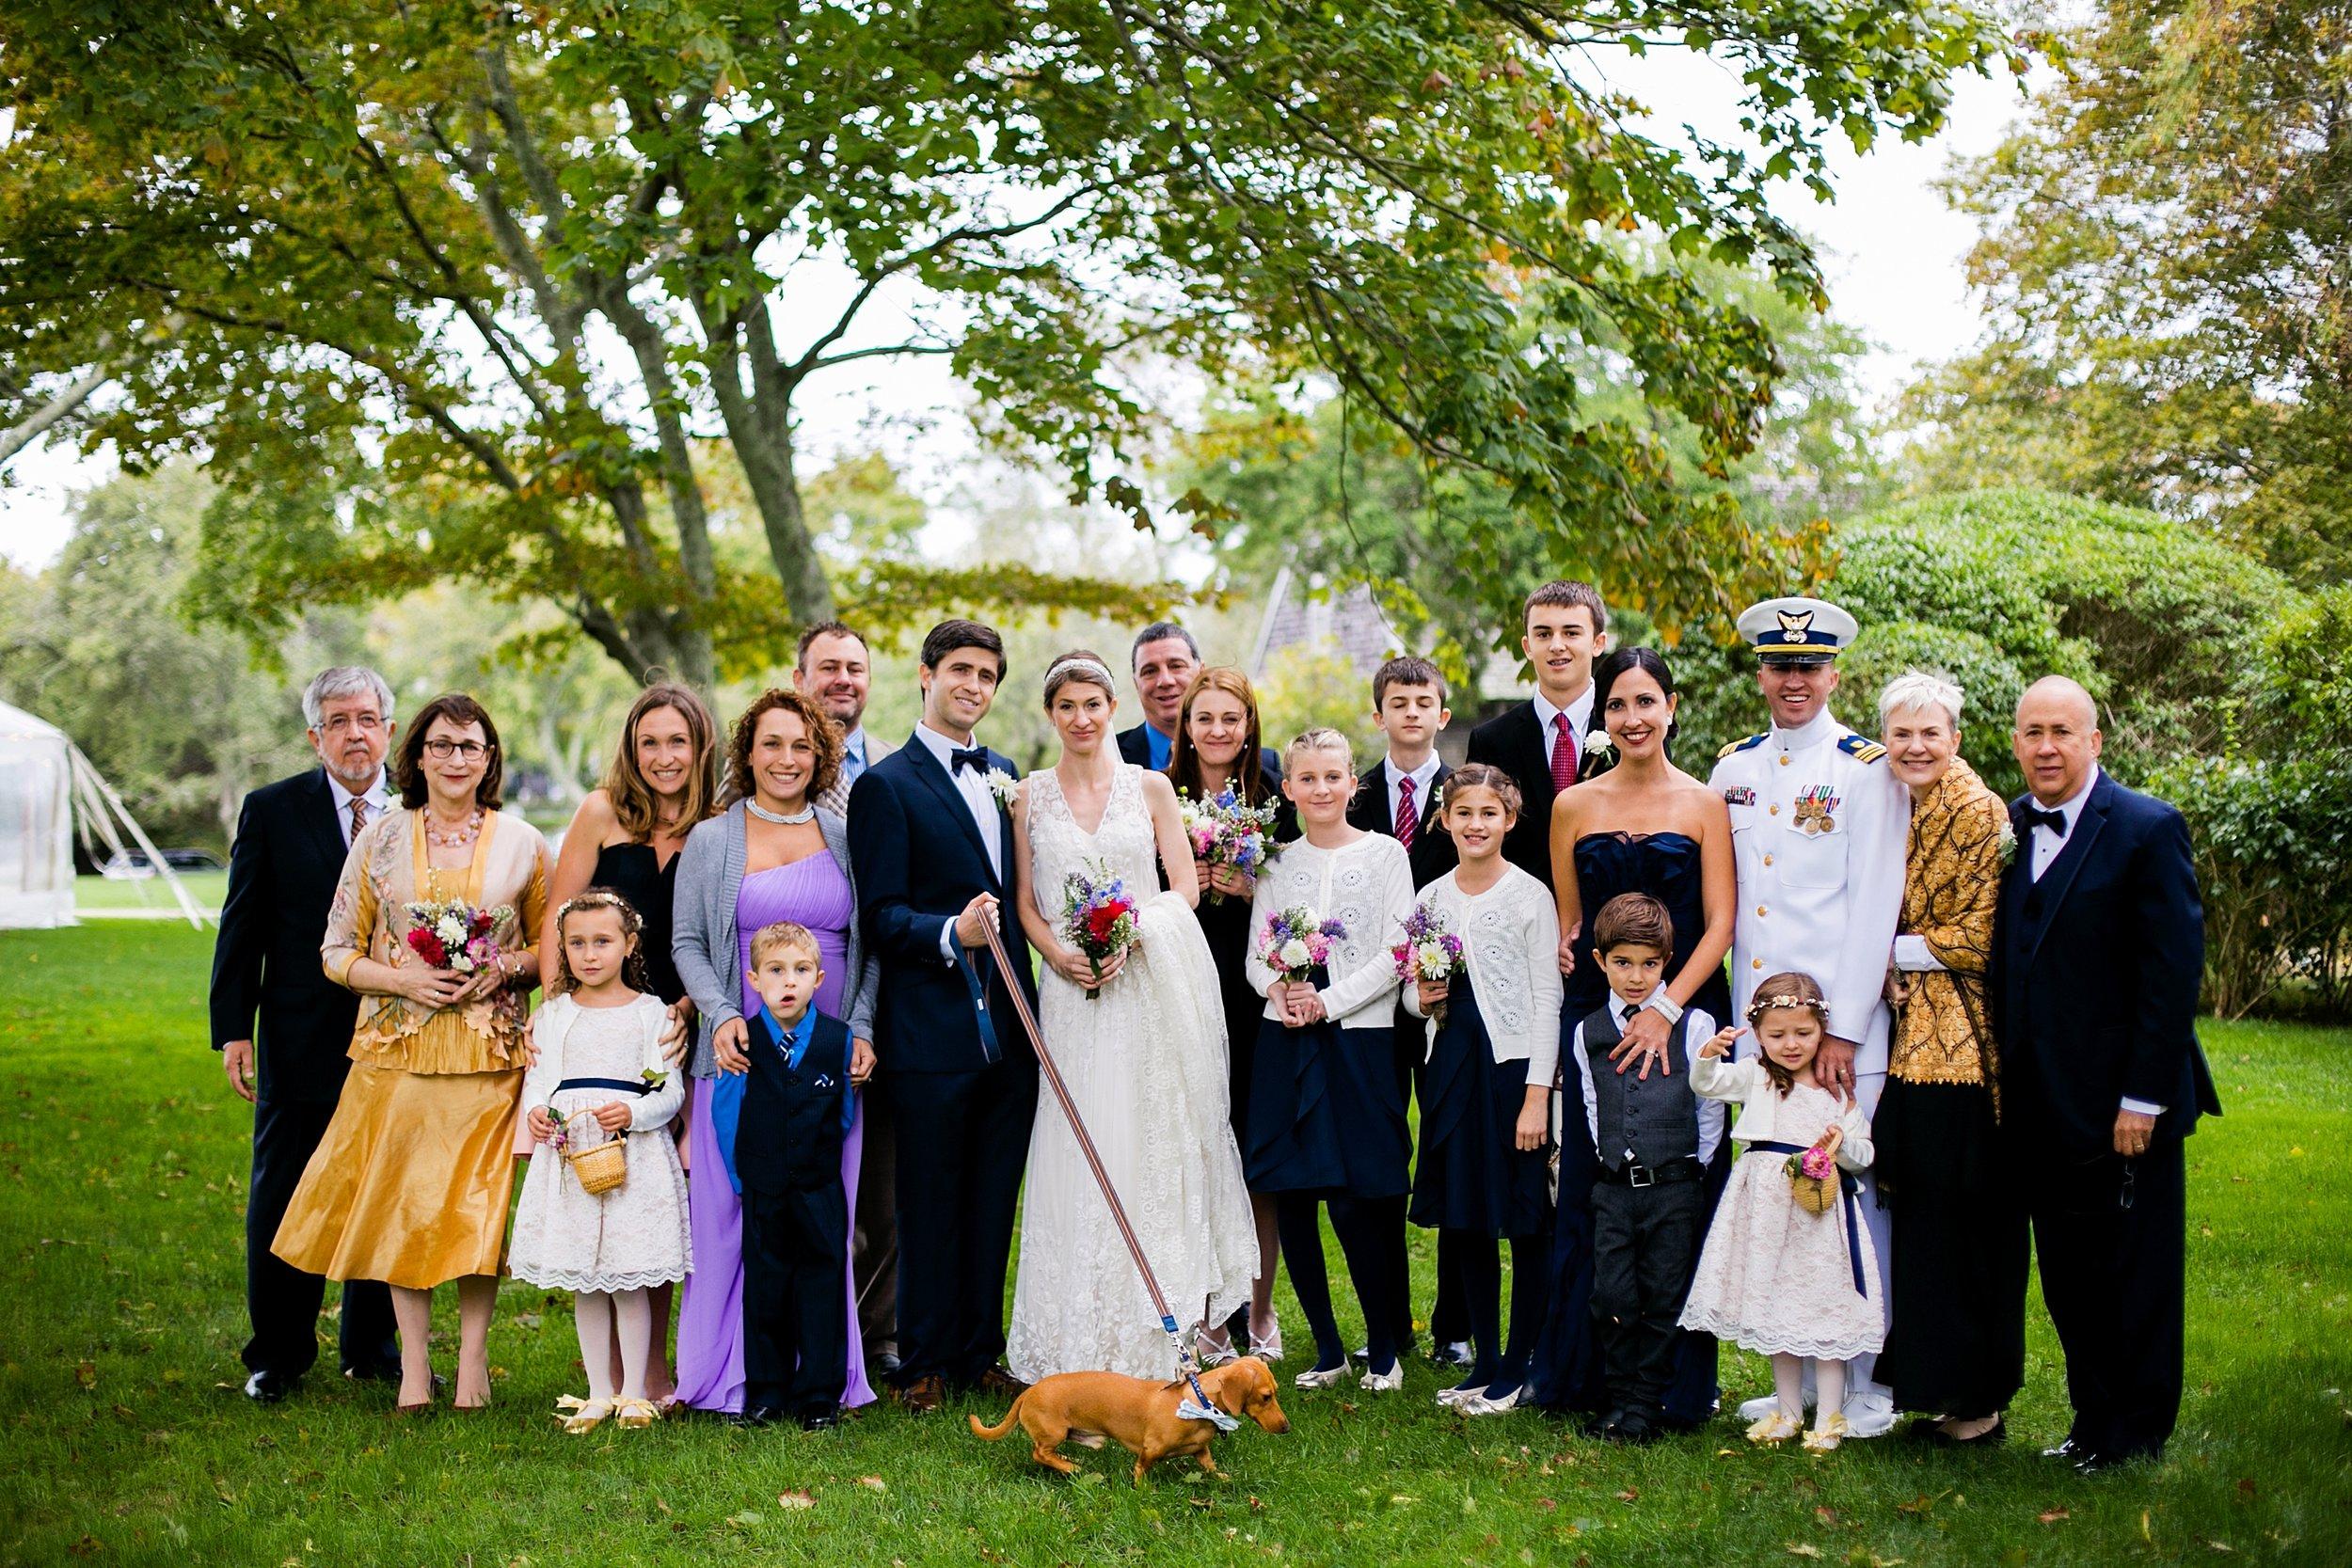 034 marthas vineyard wedding photographer todd danforth photography.jpg